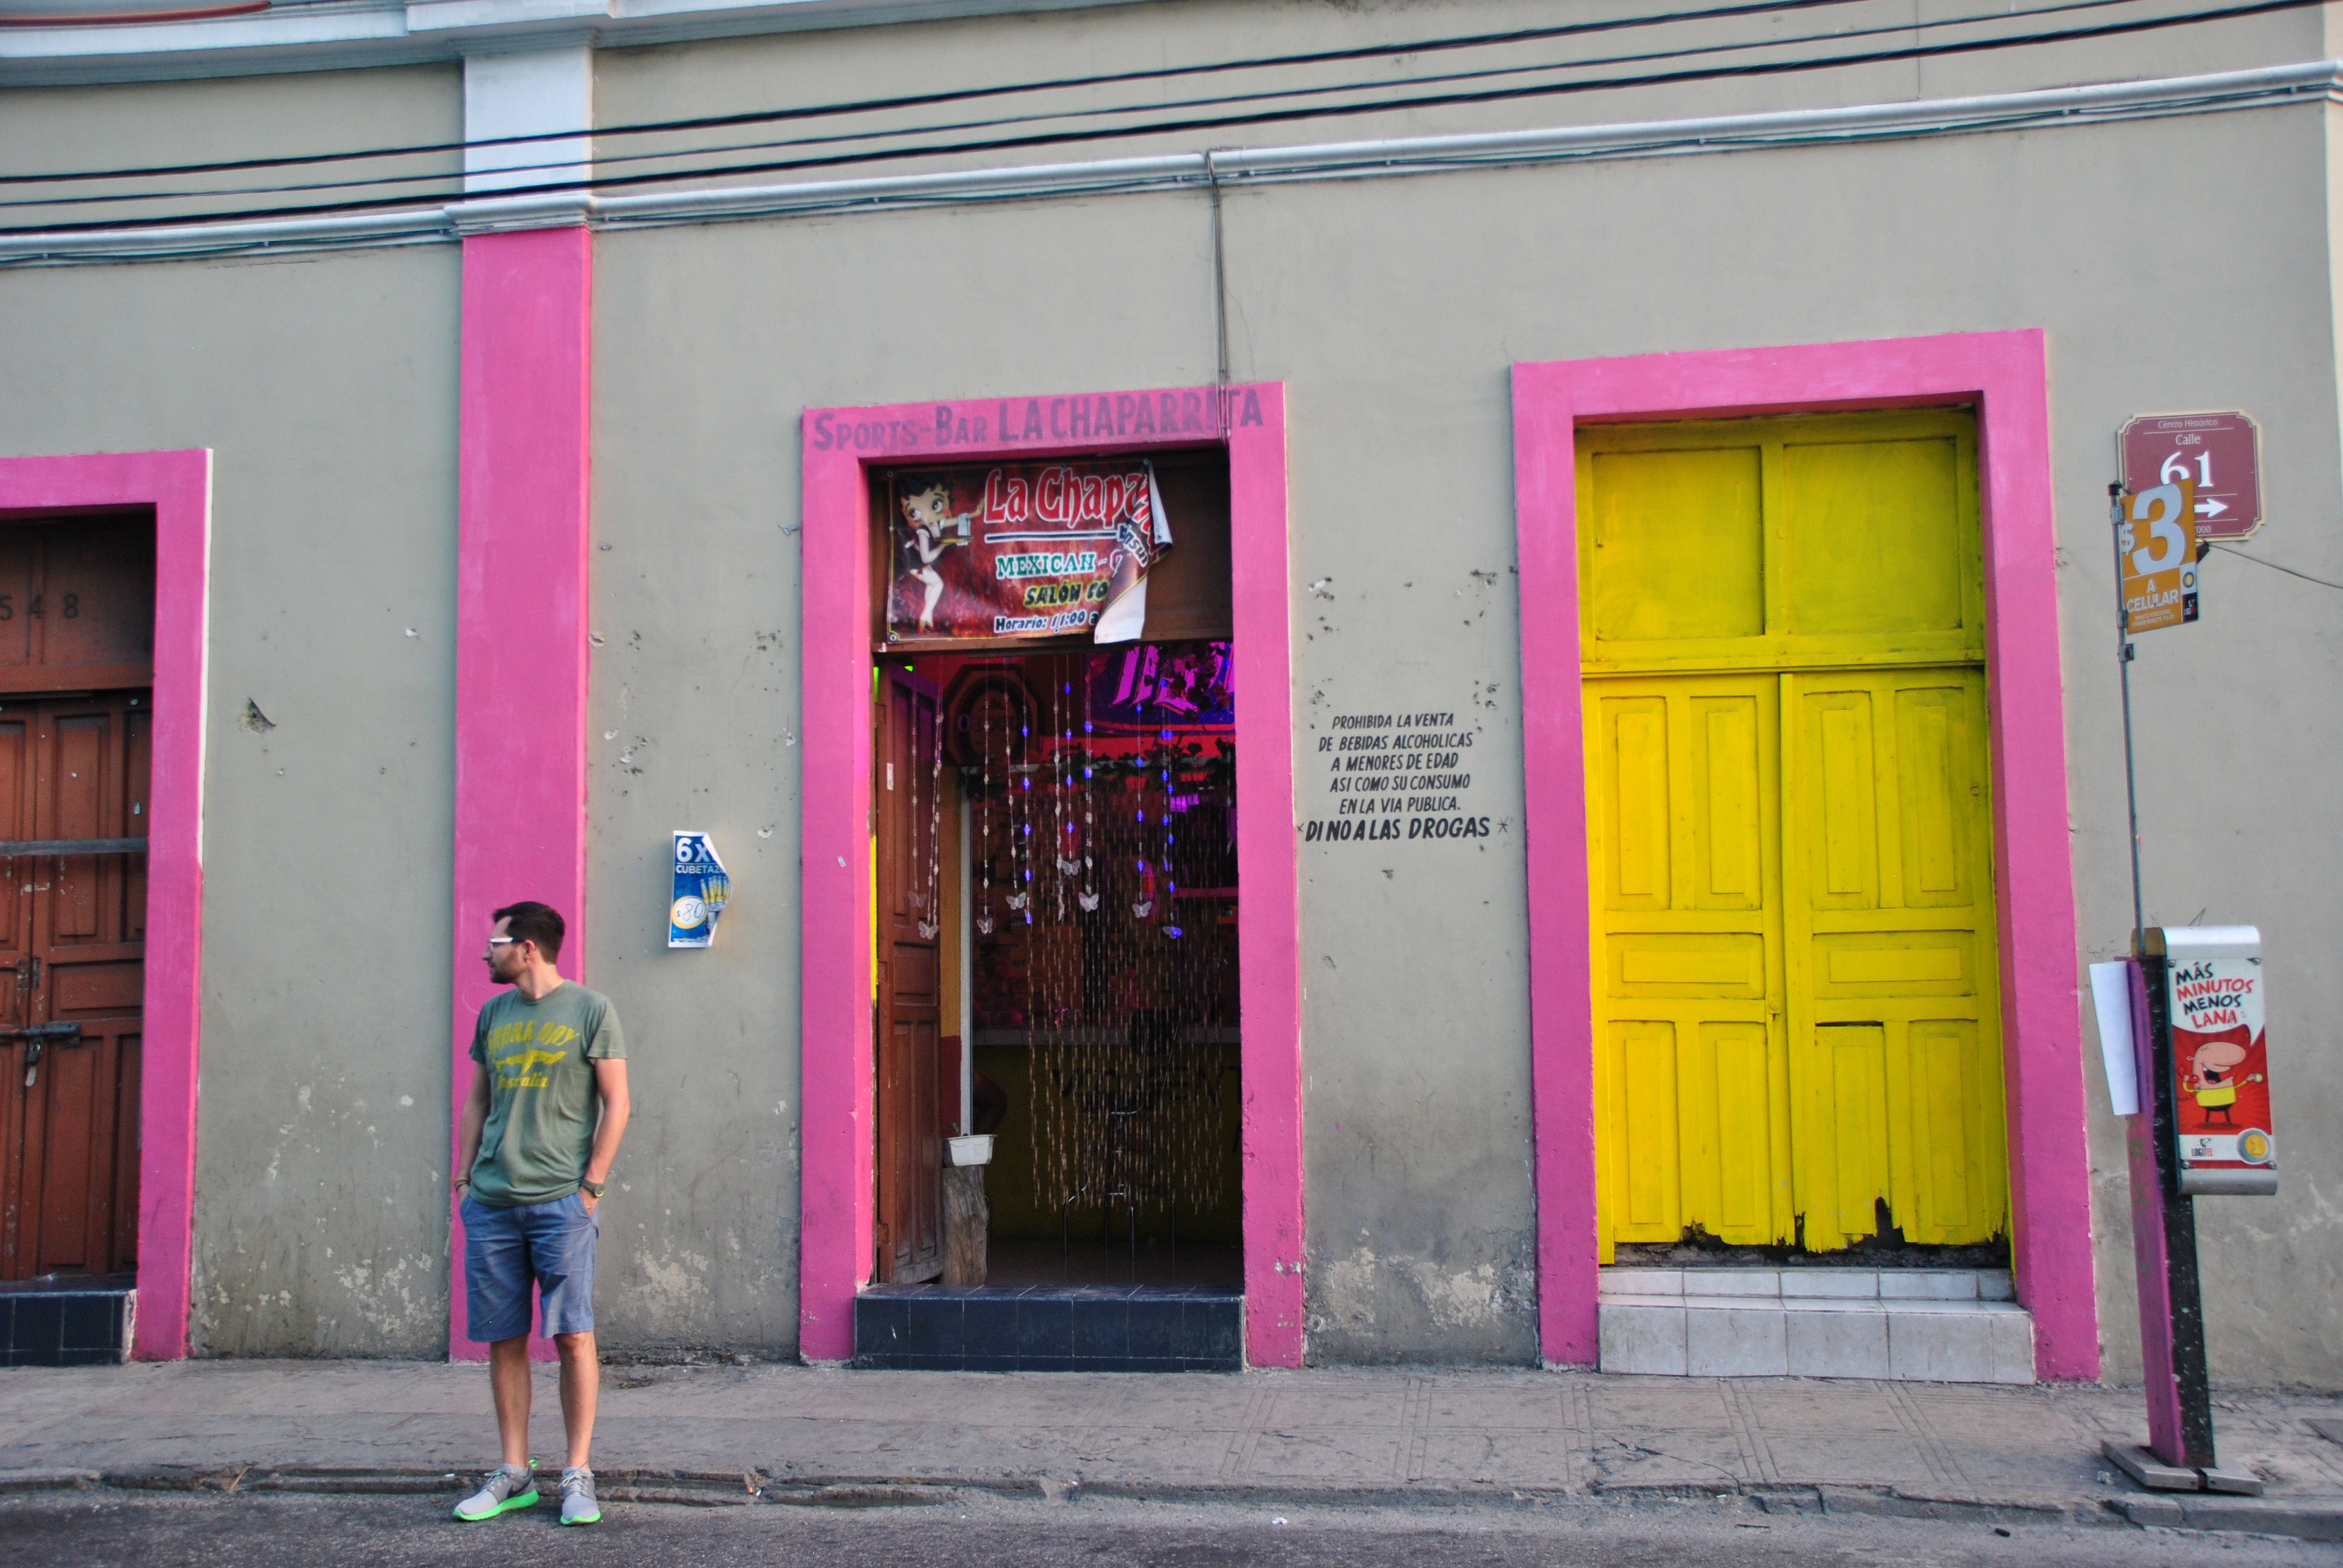 Sports bar la chaparrita Oaxaca